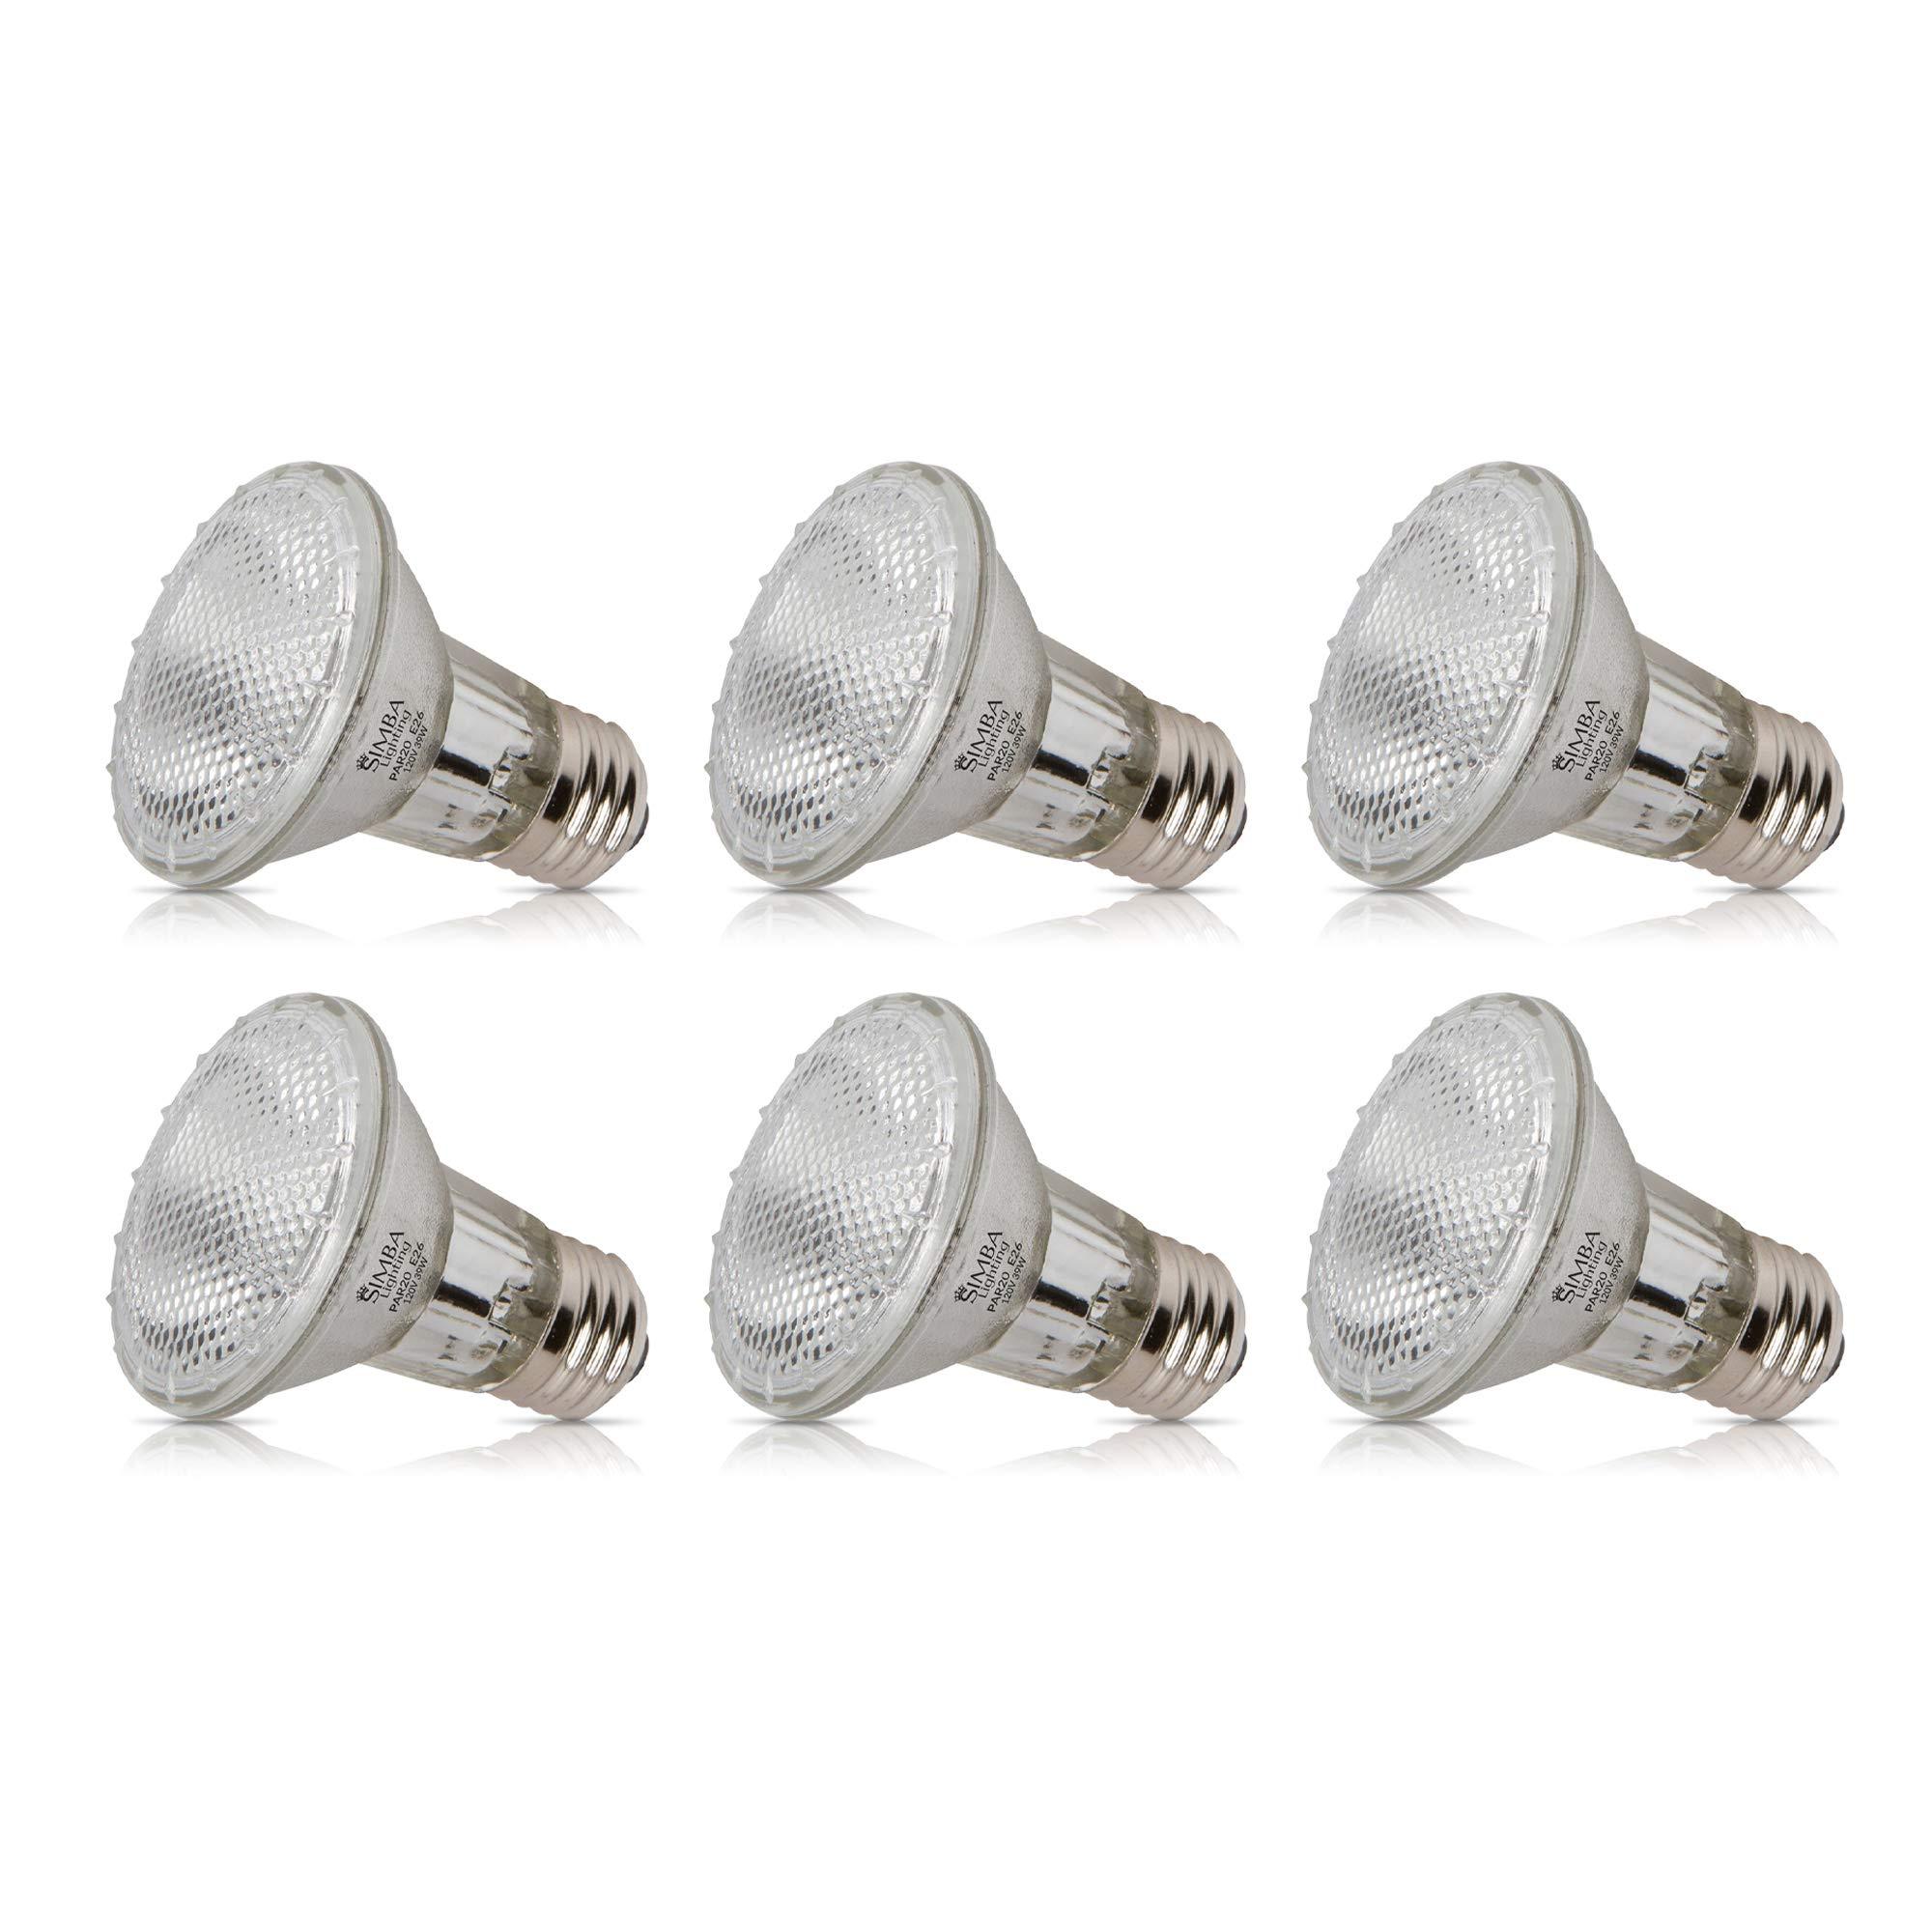 Simba Lighting Halogen PAR20 Light Bulb 39W 39PAR20/FL 30deg Spotlight Dimmable (6-Pack) for Indoor Recessed Can, Range Hood and Outdoor PAR 20, 120V E26 Base, 50W Replacement, 2700K Warm White